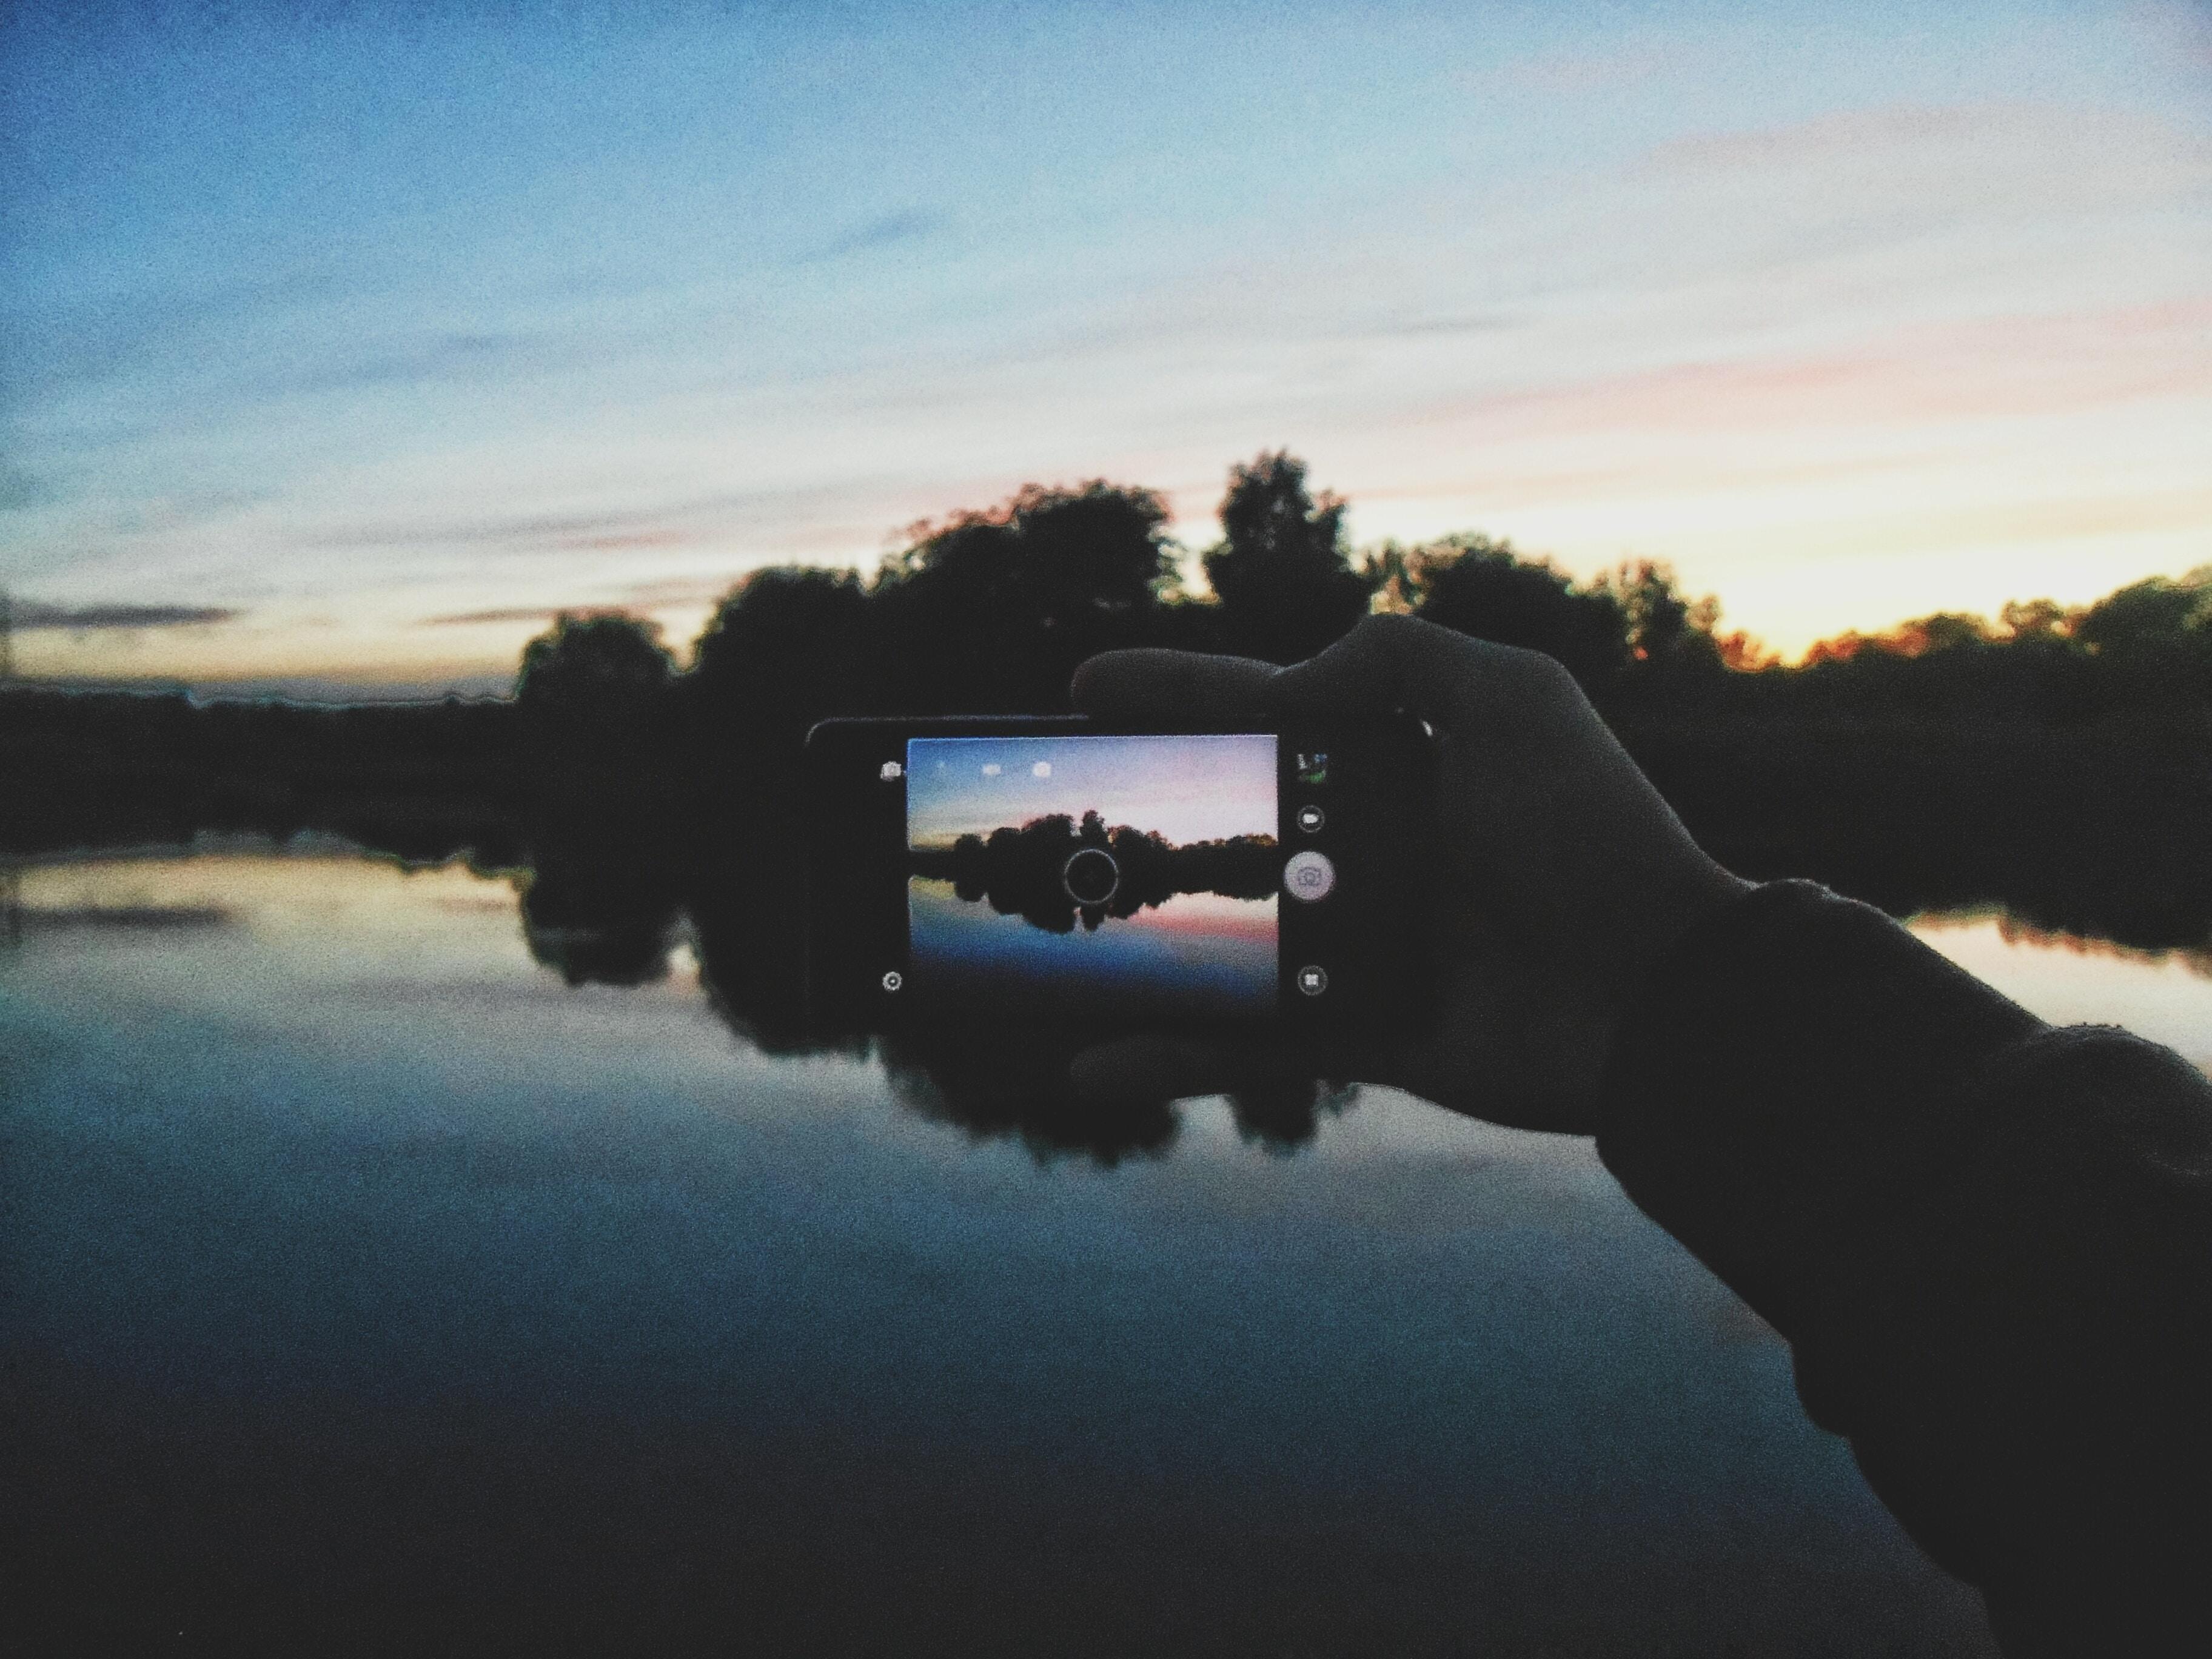 Free Unsplash photo from Artem Kulikov